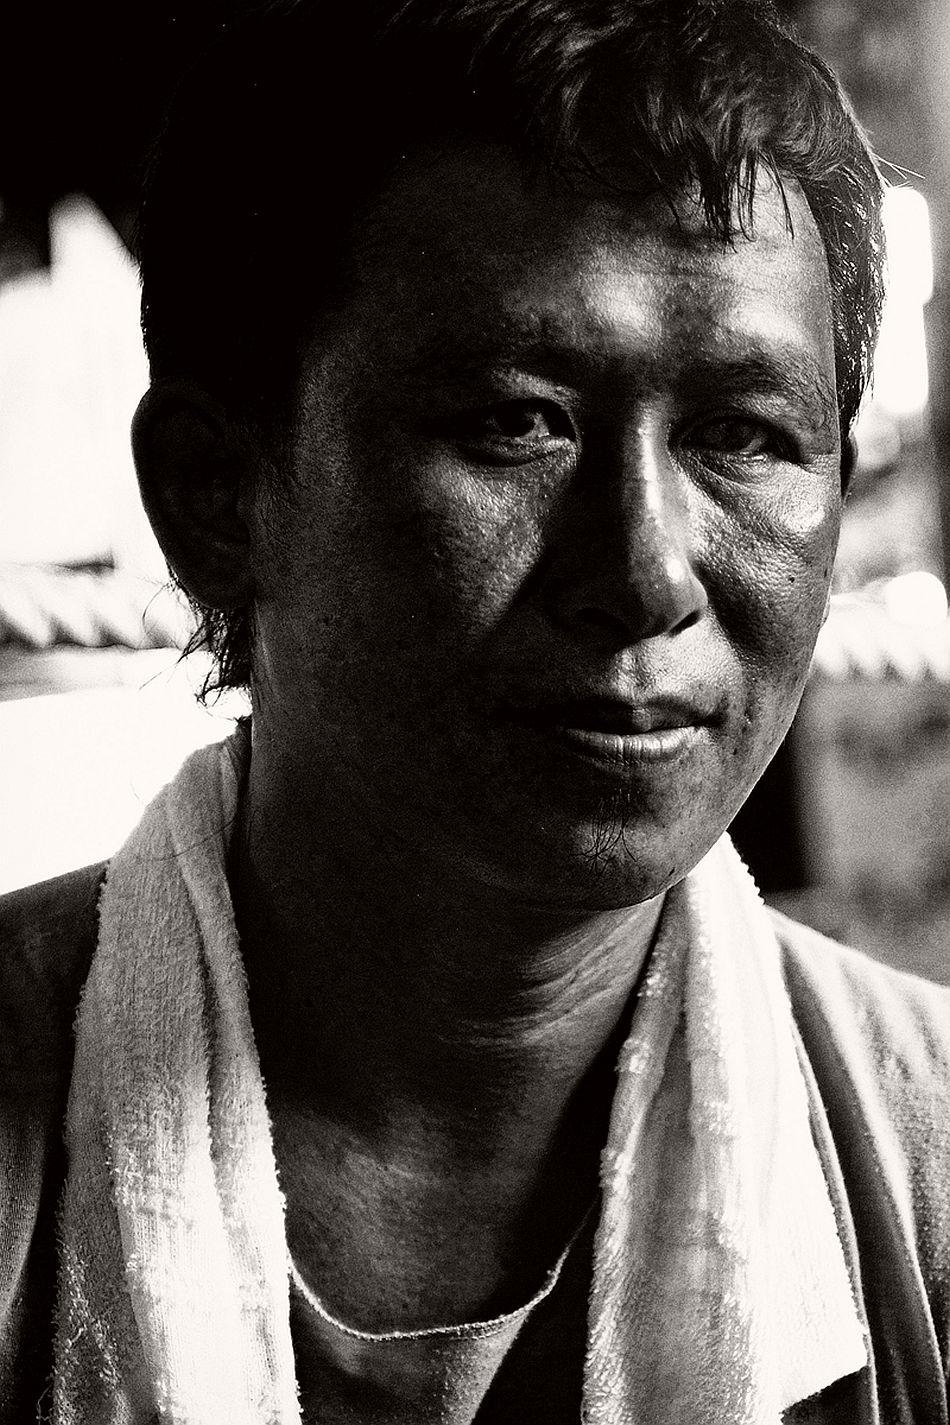 davide-palmisano-the-muay-thai-boxing-03